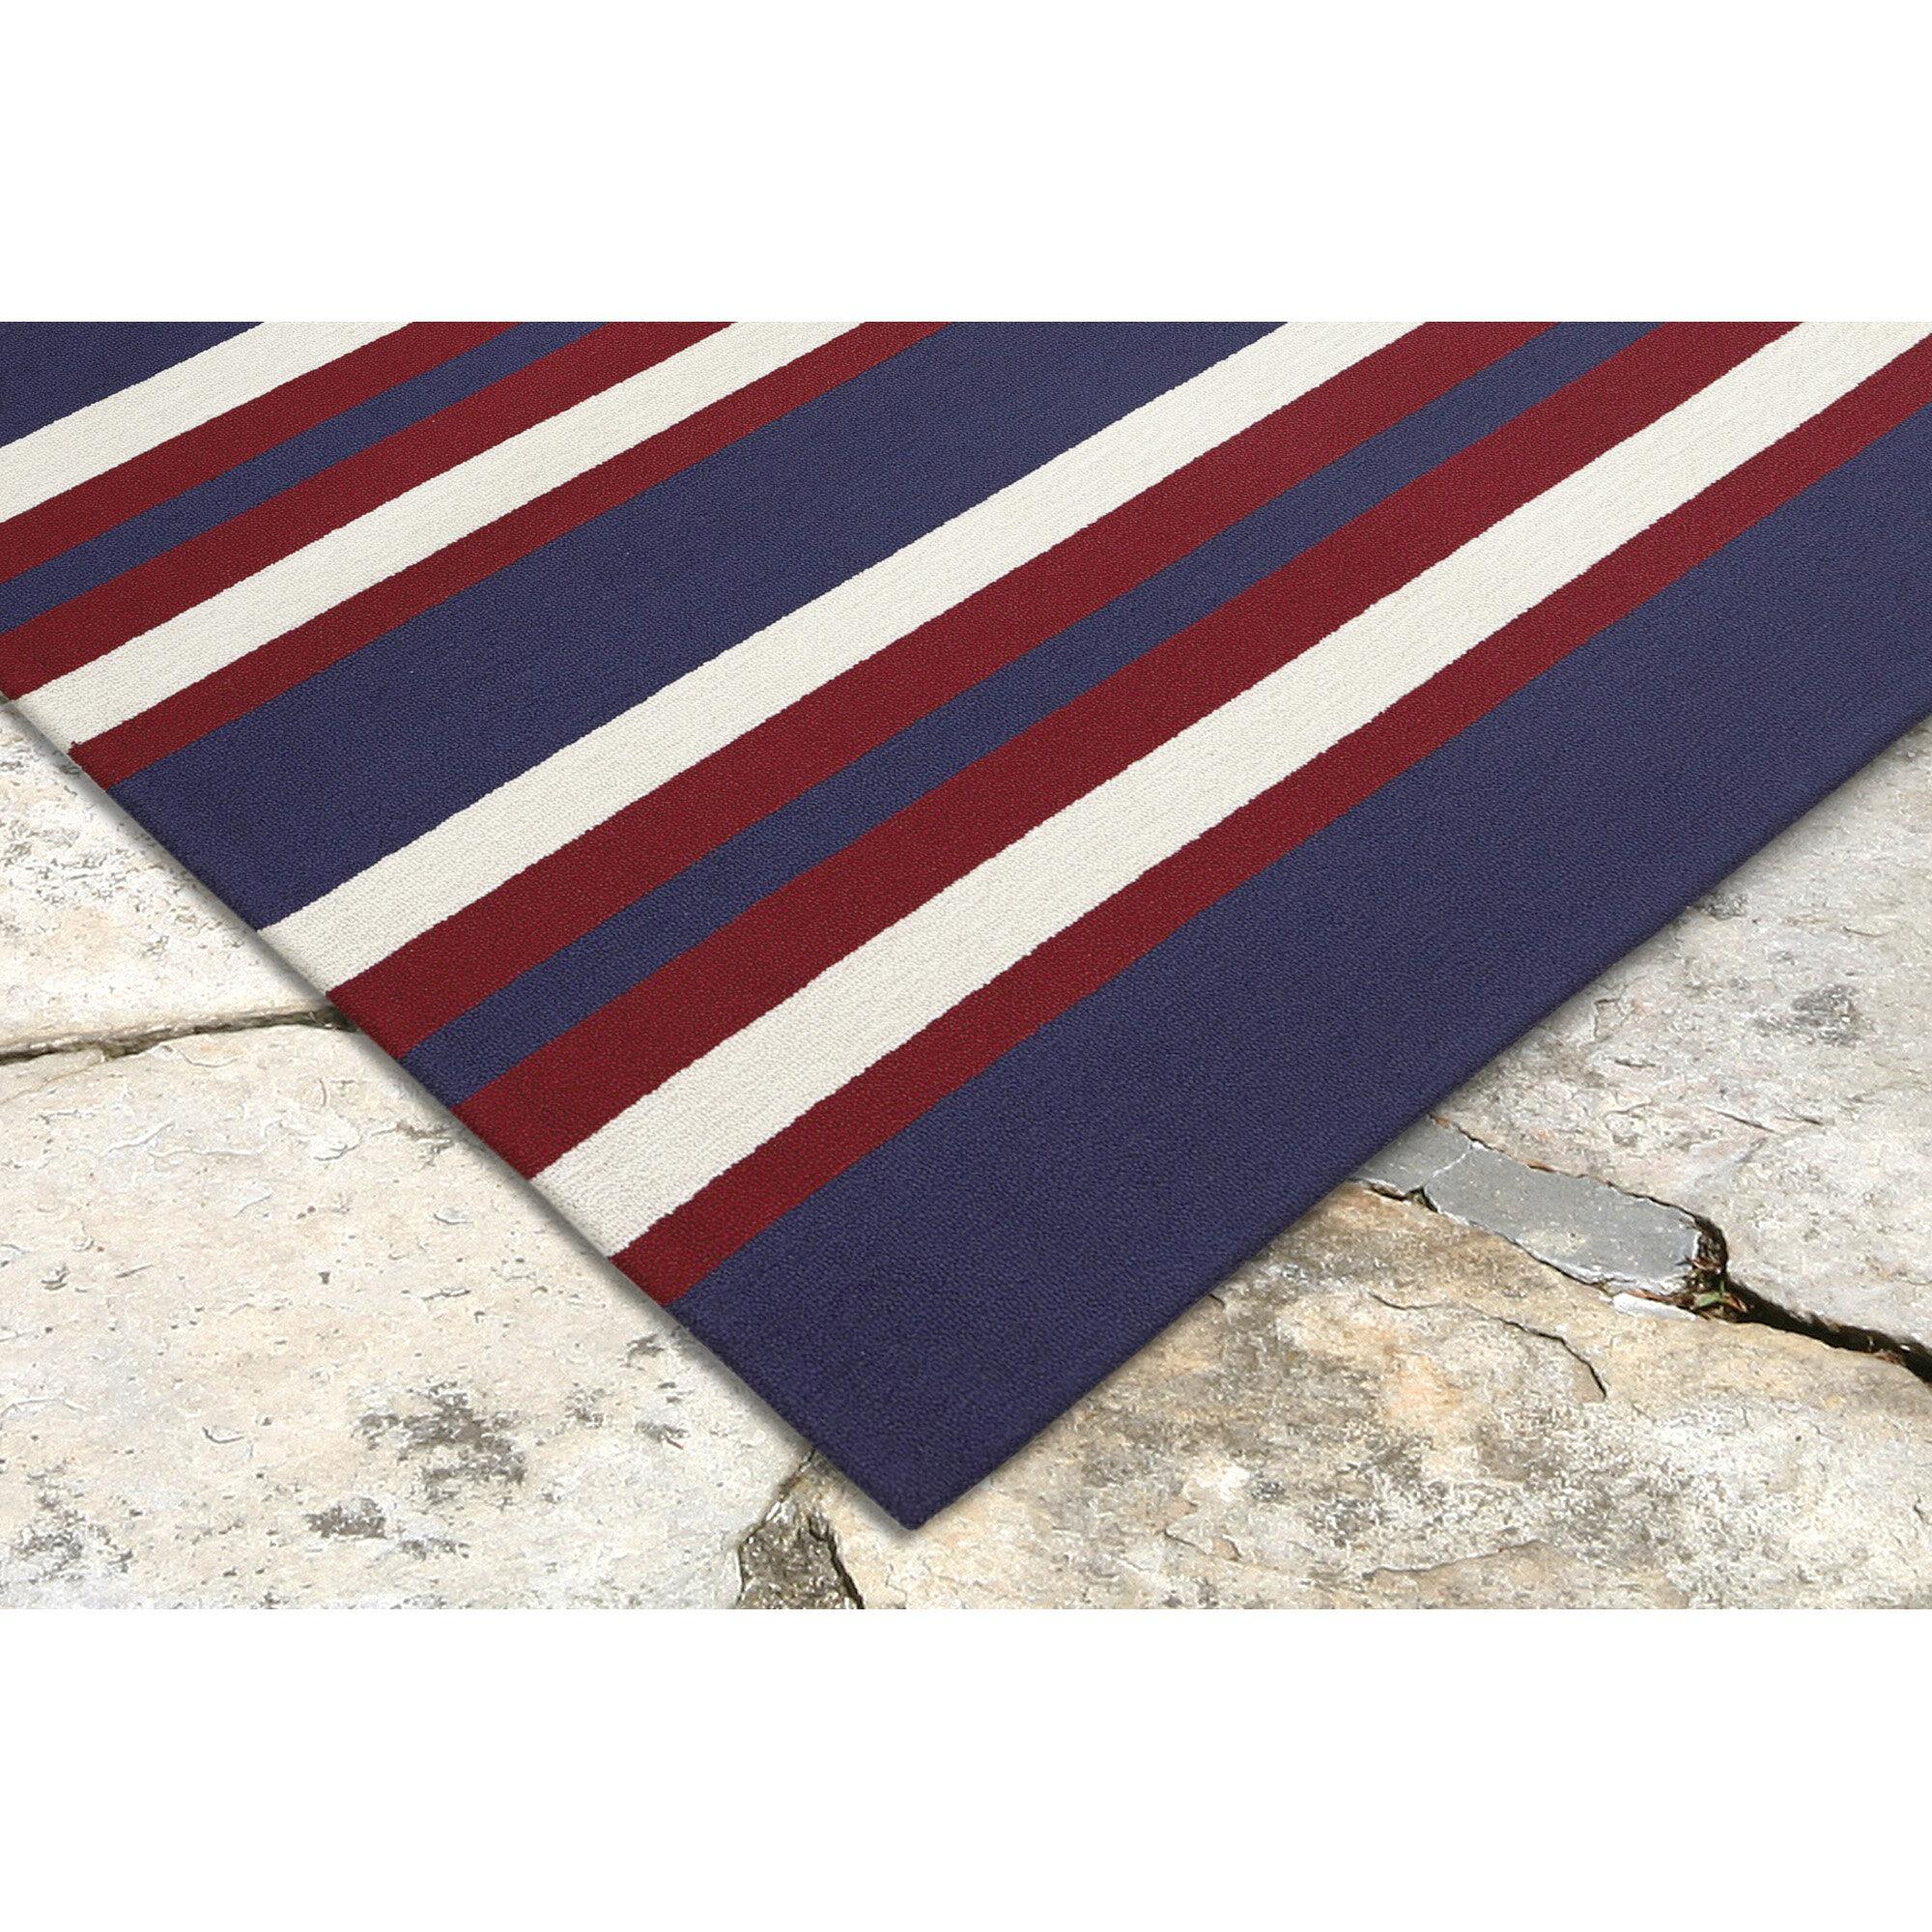 Nautical Patio Rug: Breakwater Bay Cranford Nautical Stripe Hand-Tufted Red